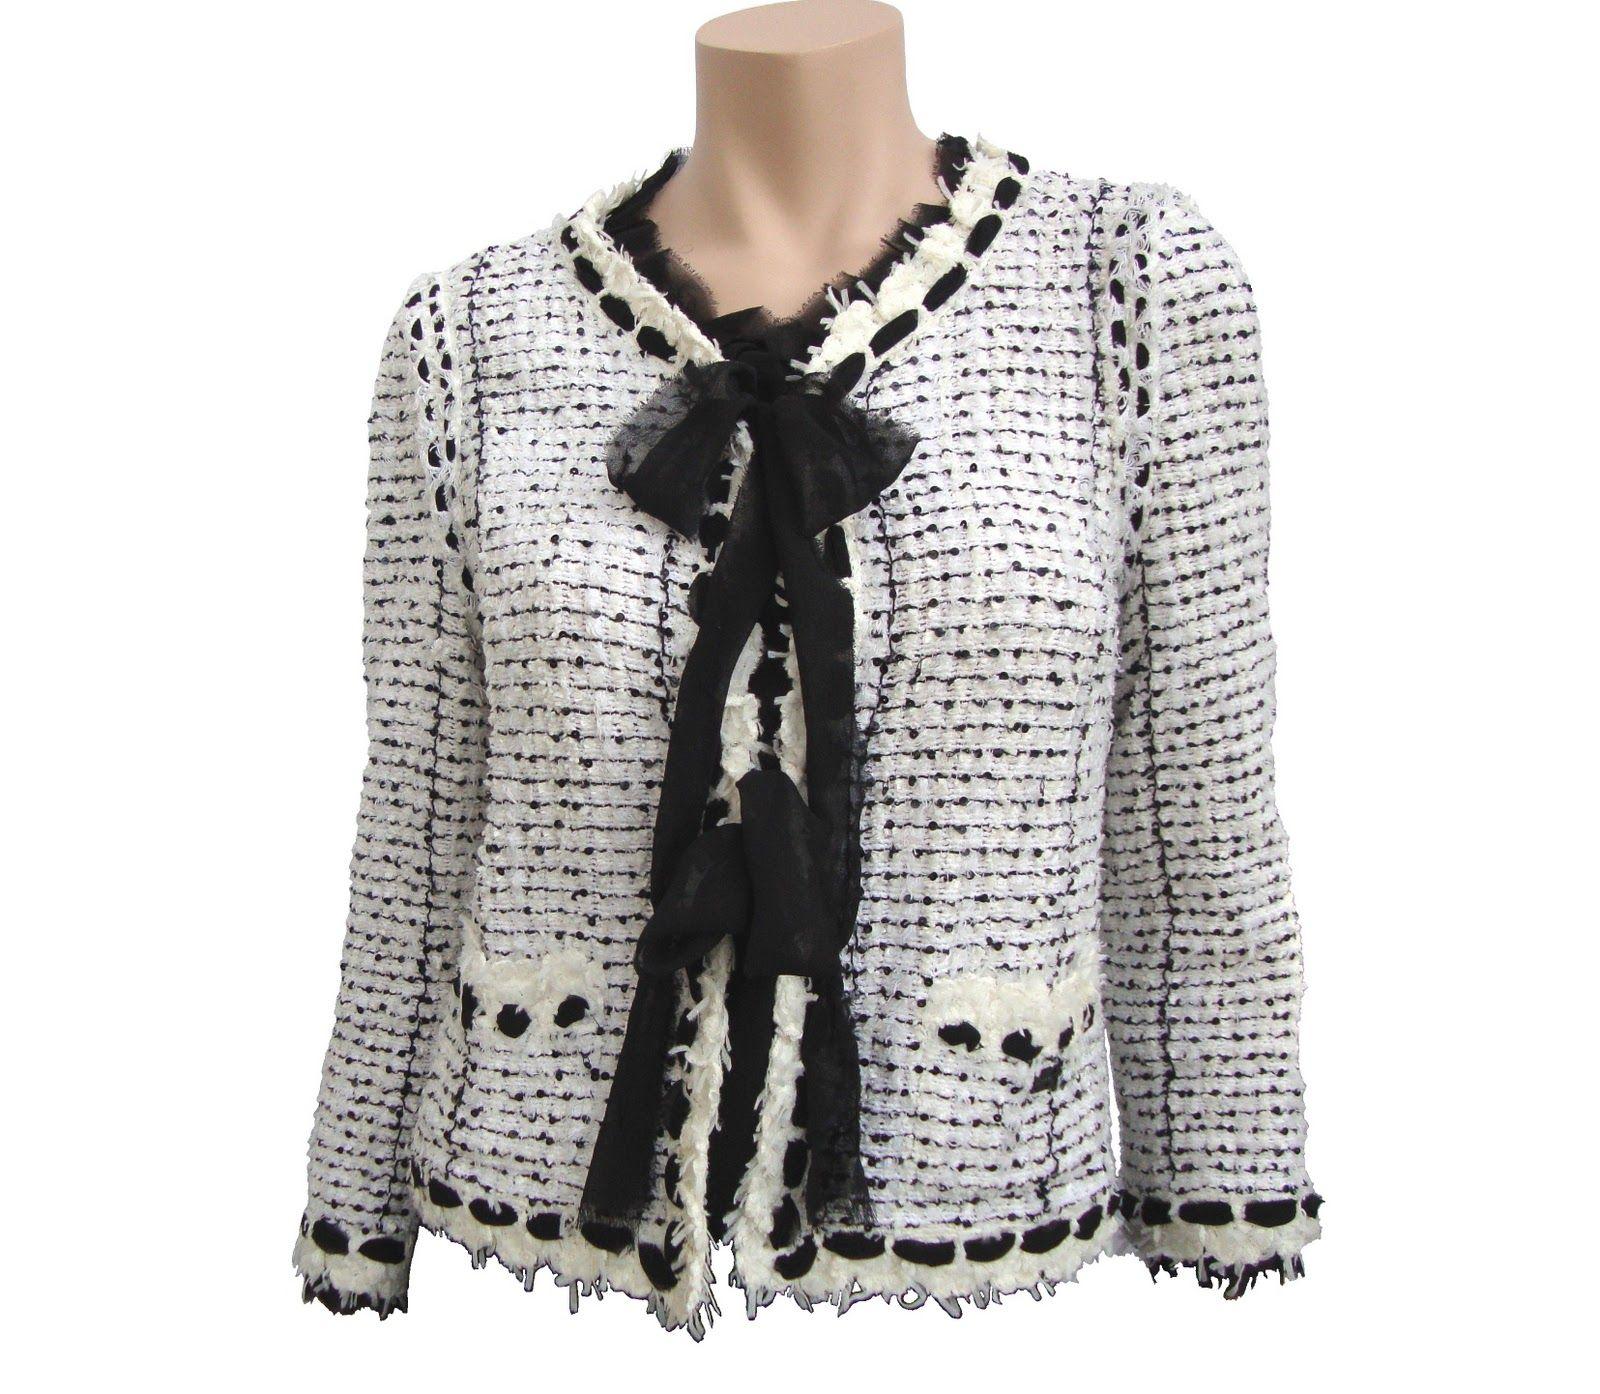 chanel jackets | Vintage Chanel Jacket